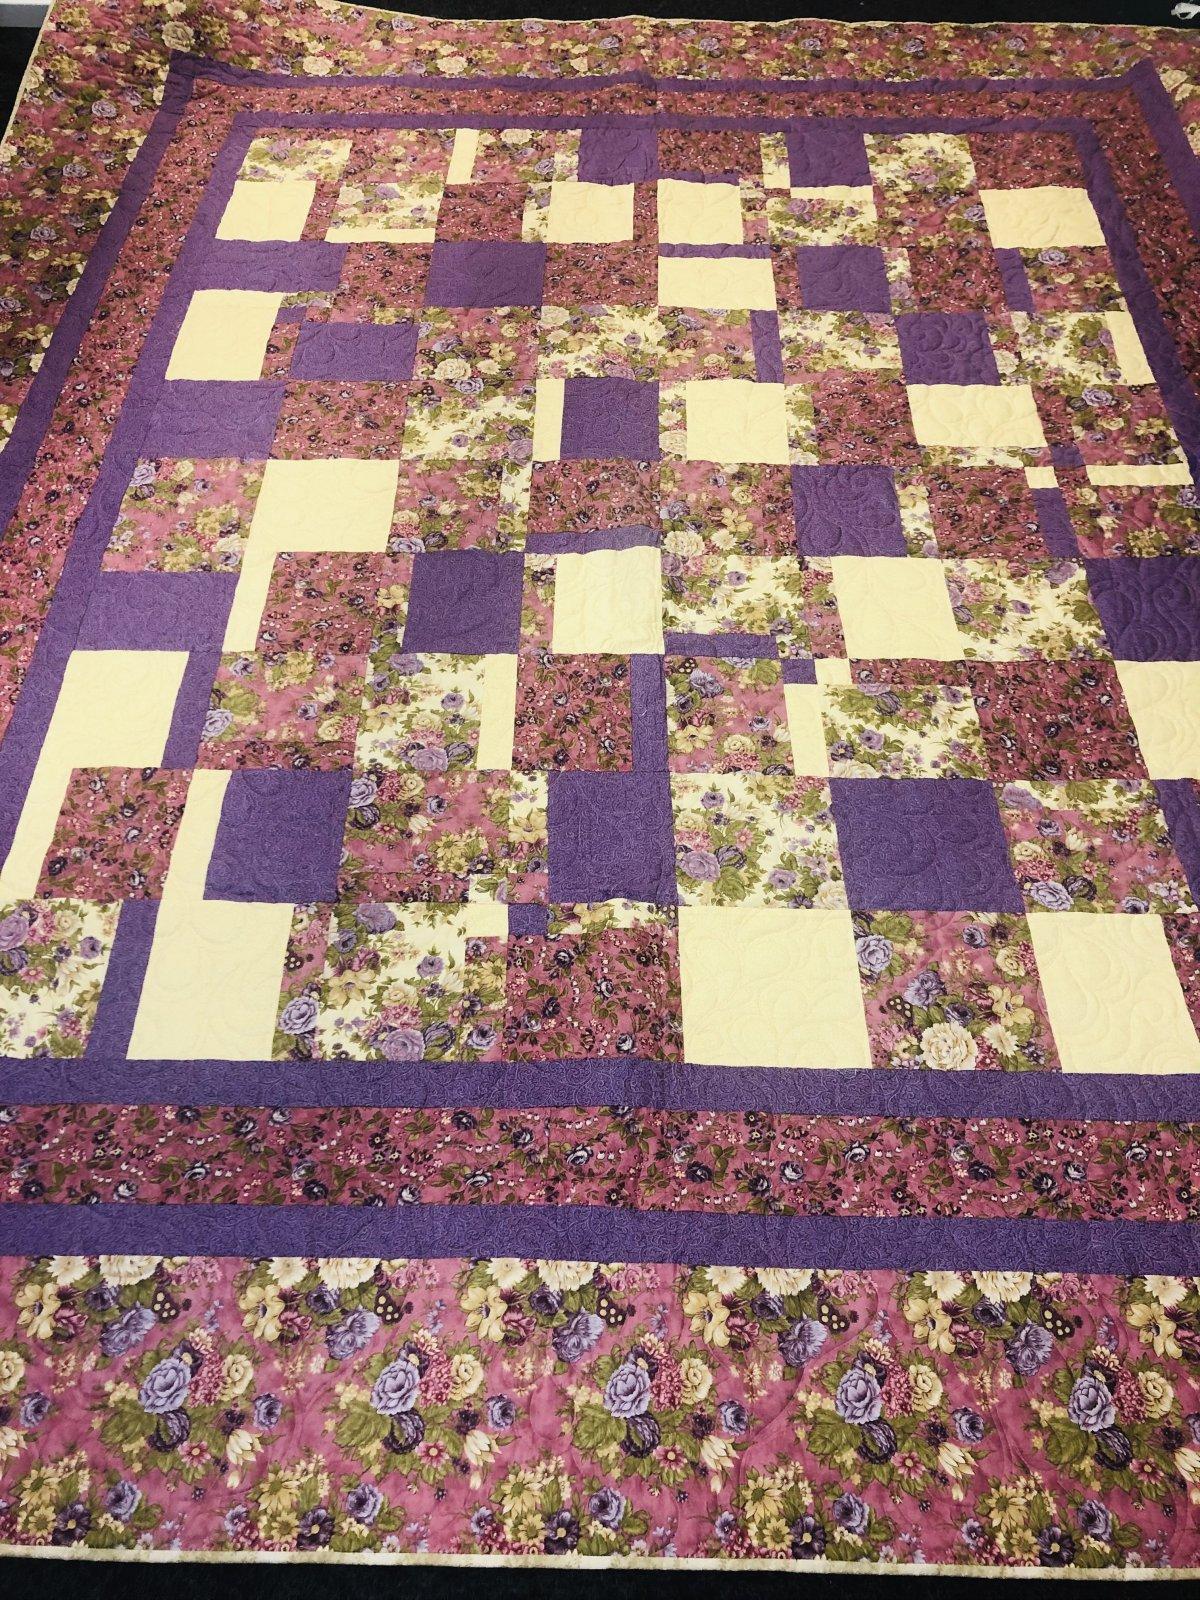 Lavender Field Flowers Quilt 96 X 100